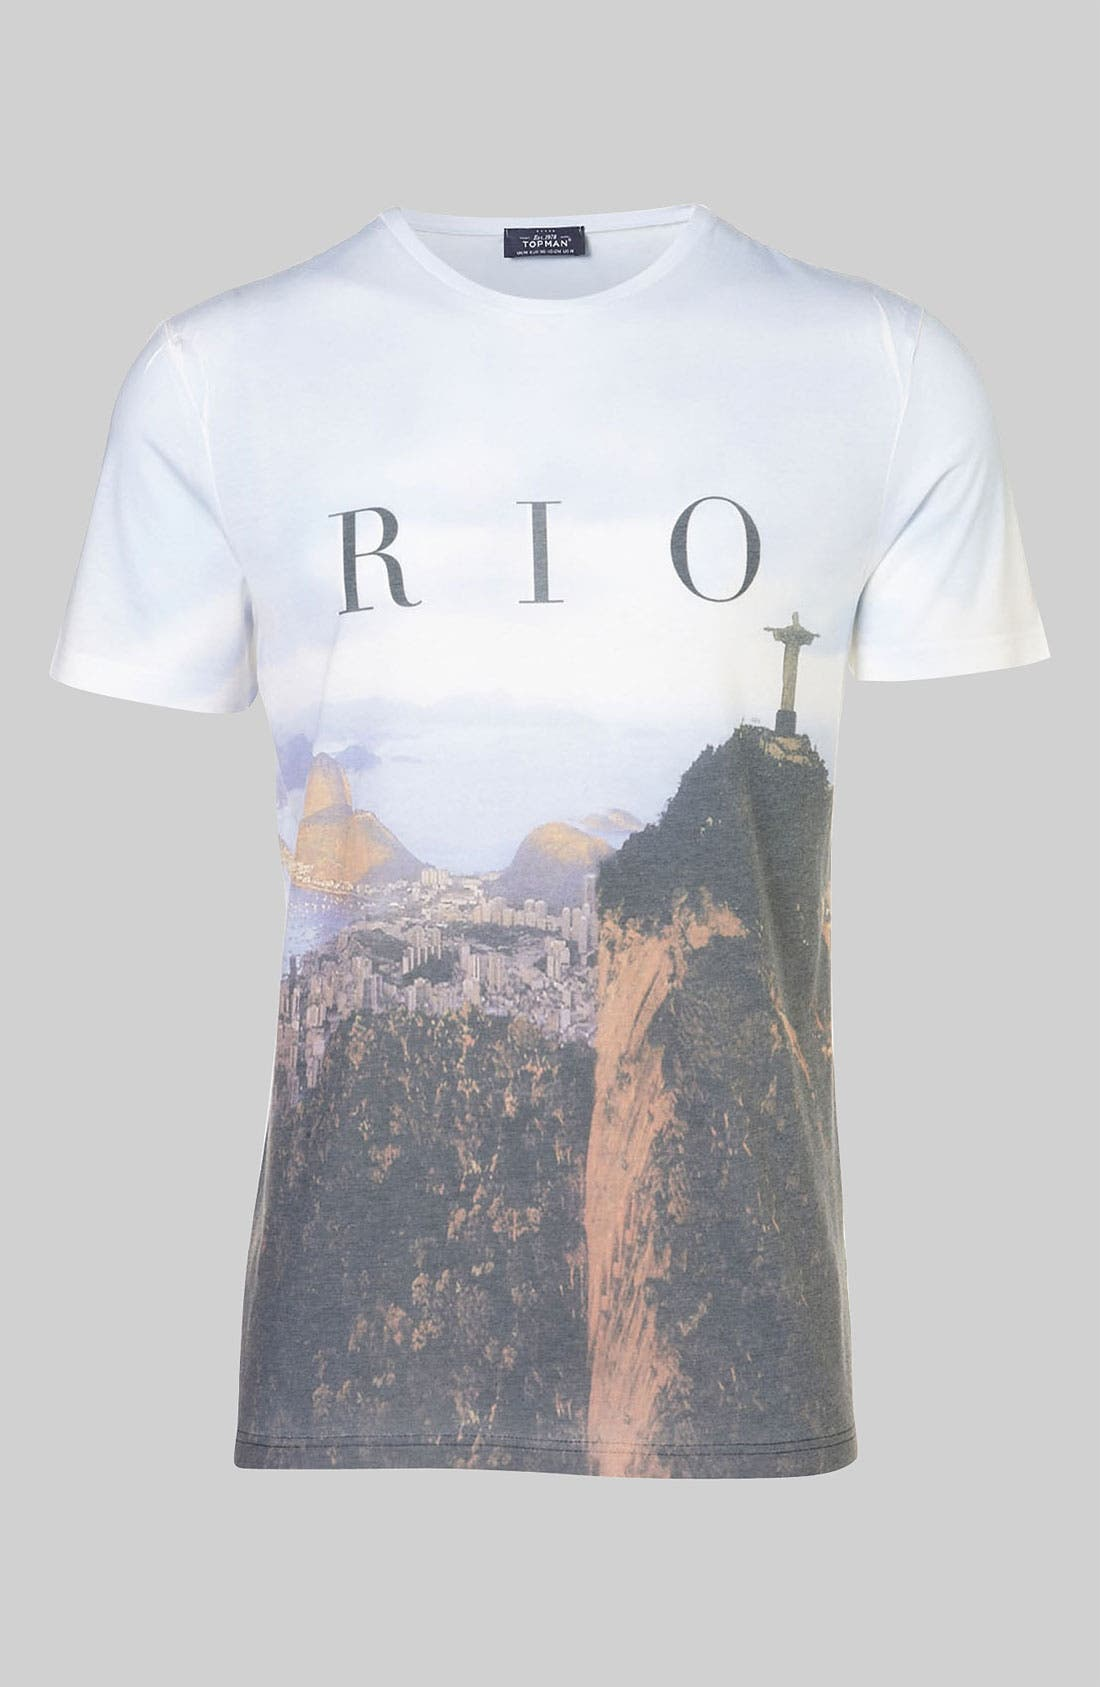 Main Image - Topman 'Rio Sublimation' Graphic T-Shirt